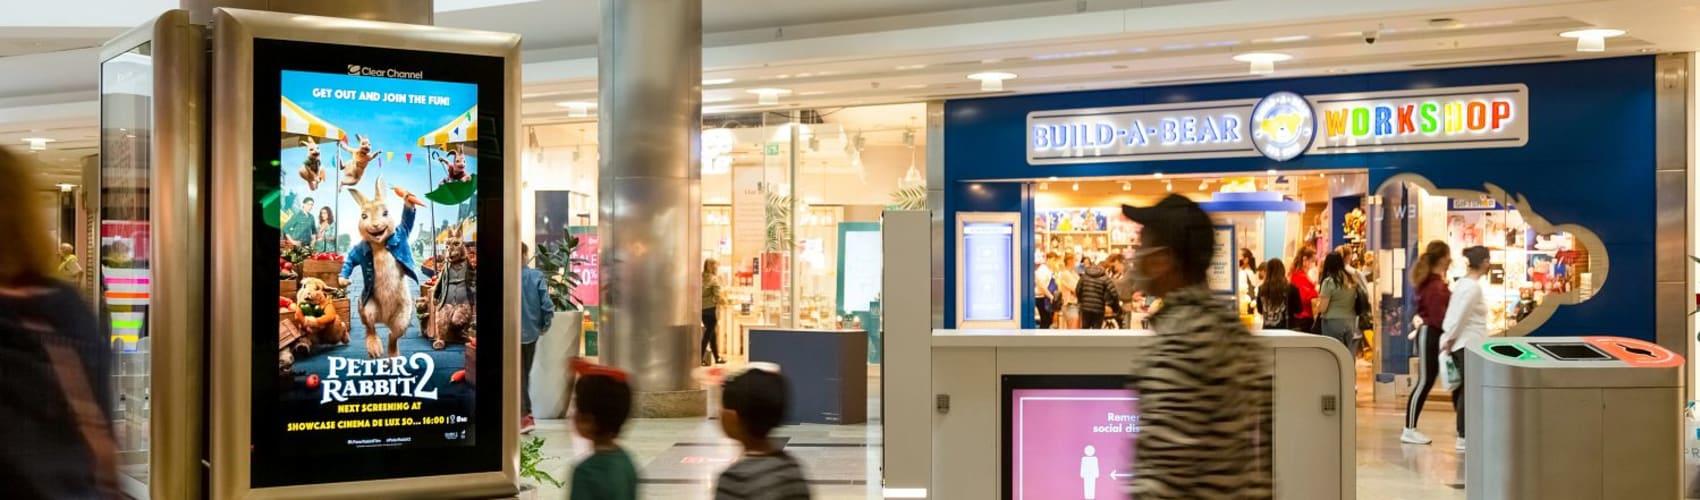 Full motion video creative on malls screen